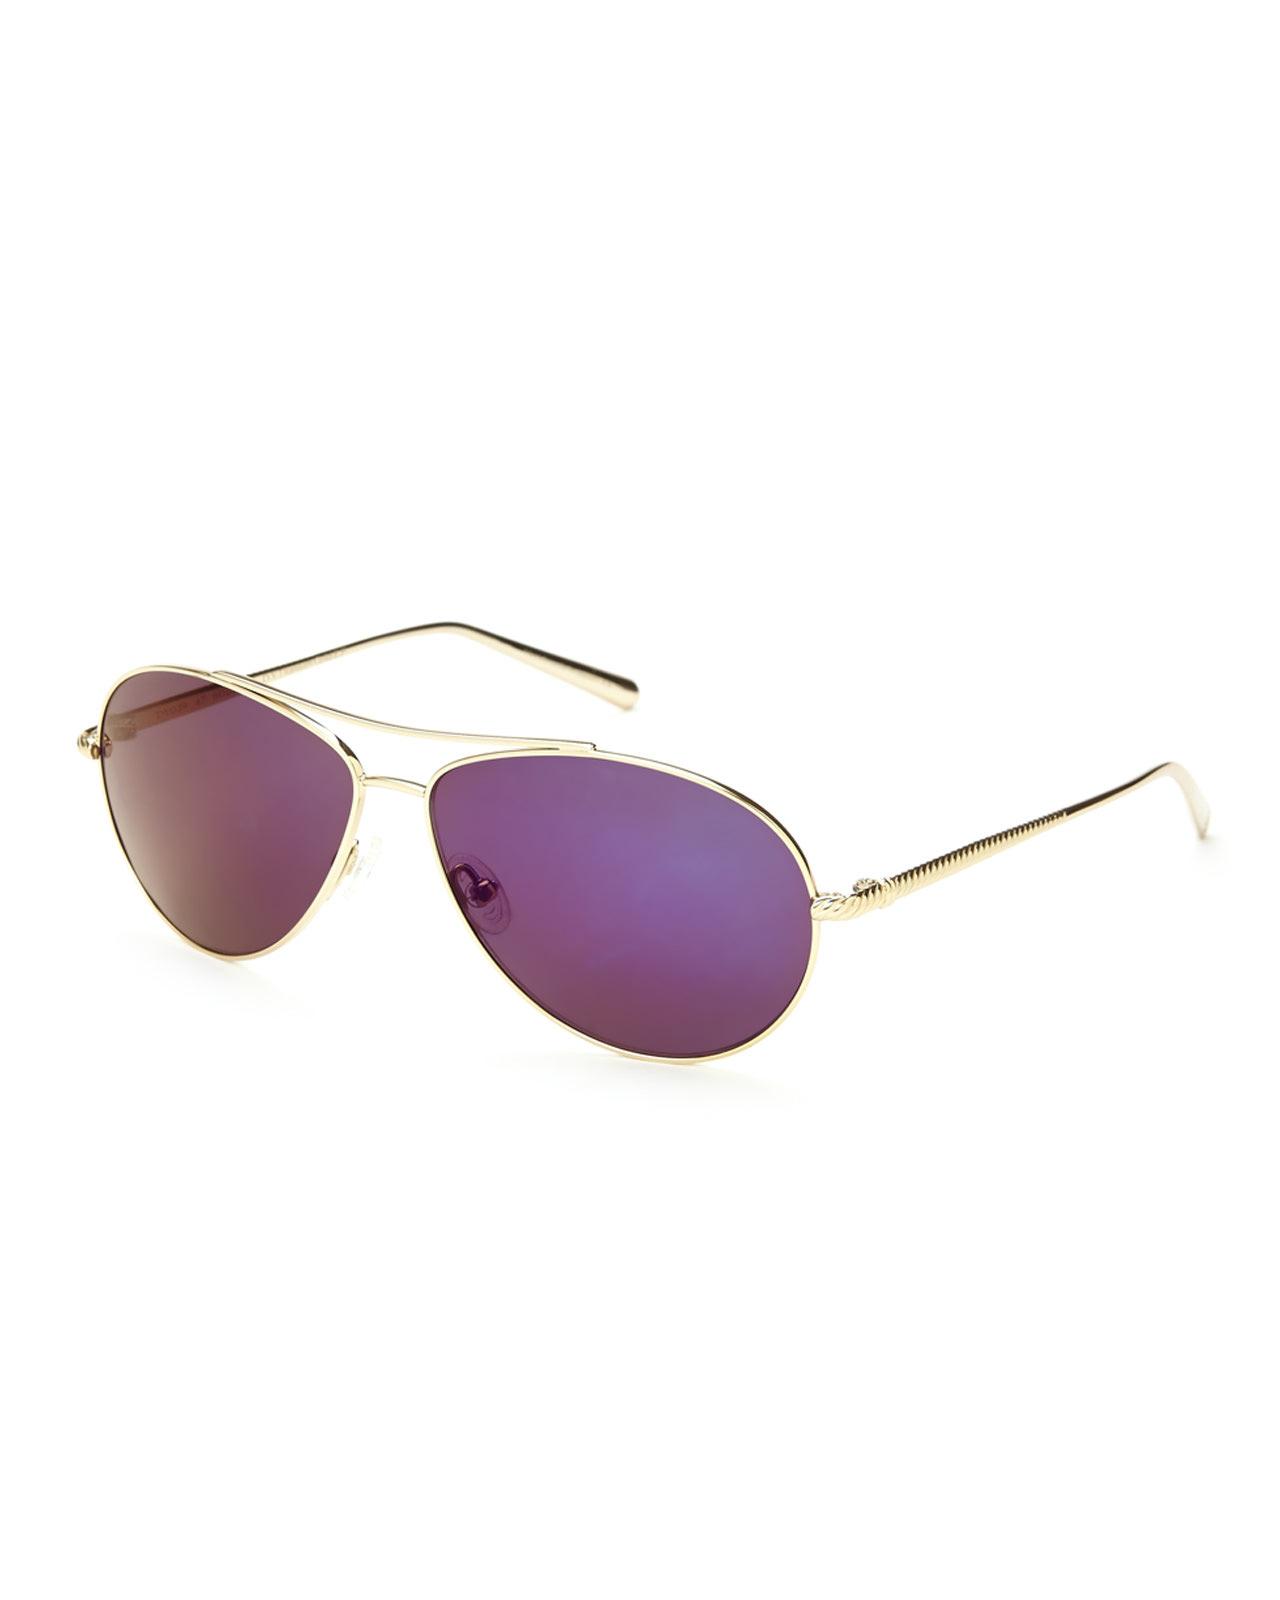 Purple Tinted Sunglasses  david yurman dy039 gold tone purple tinted aviator sunglasses in